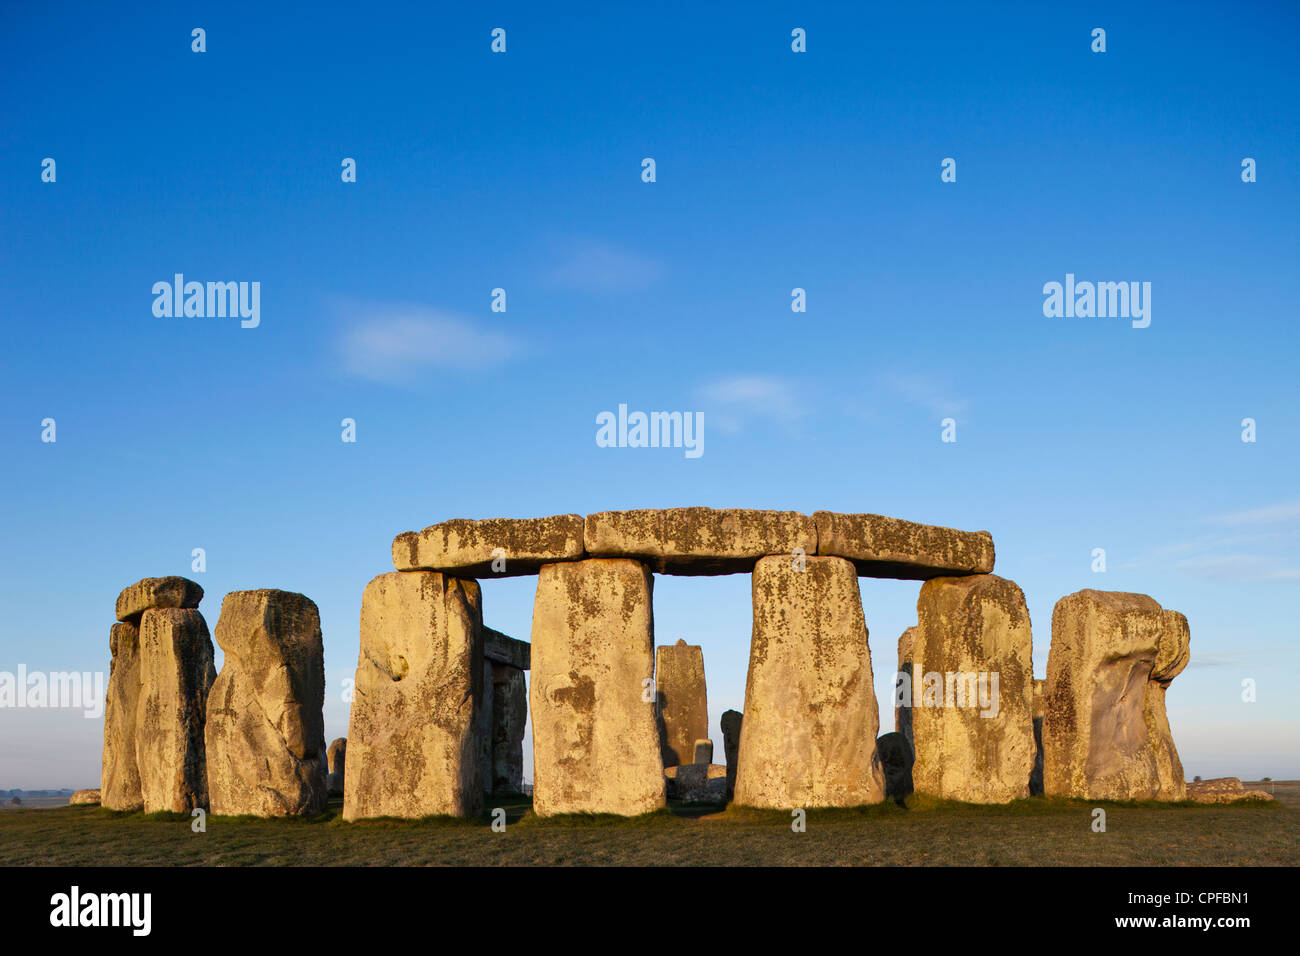 England, Wiltshire, Stonehenge Stockfoto